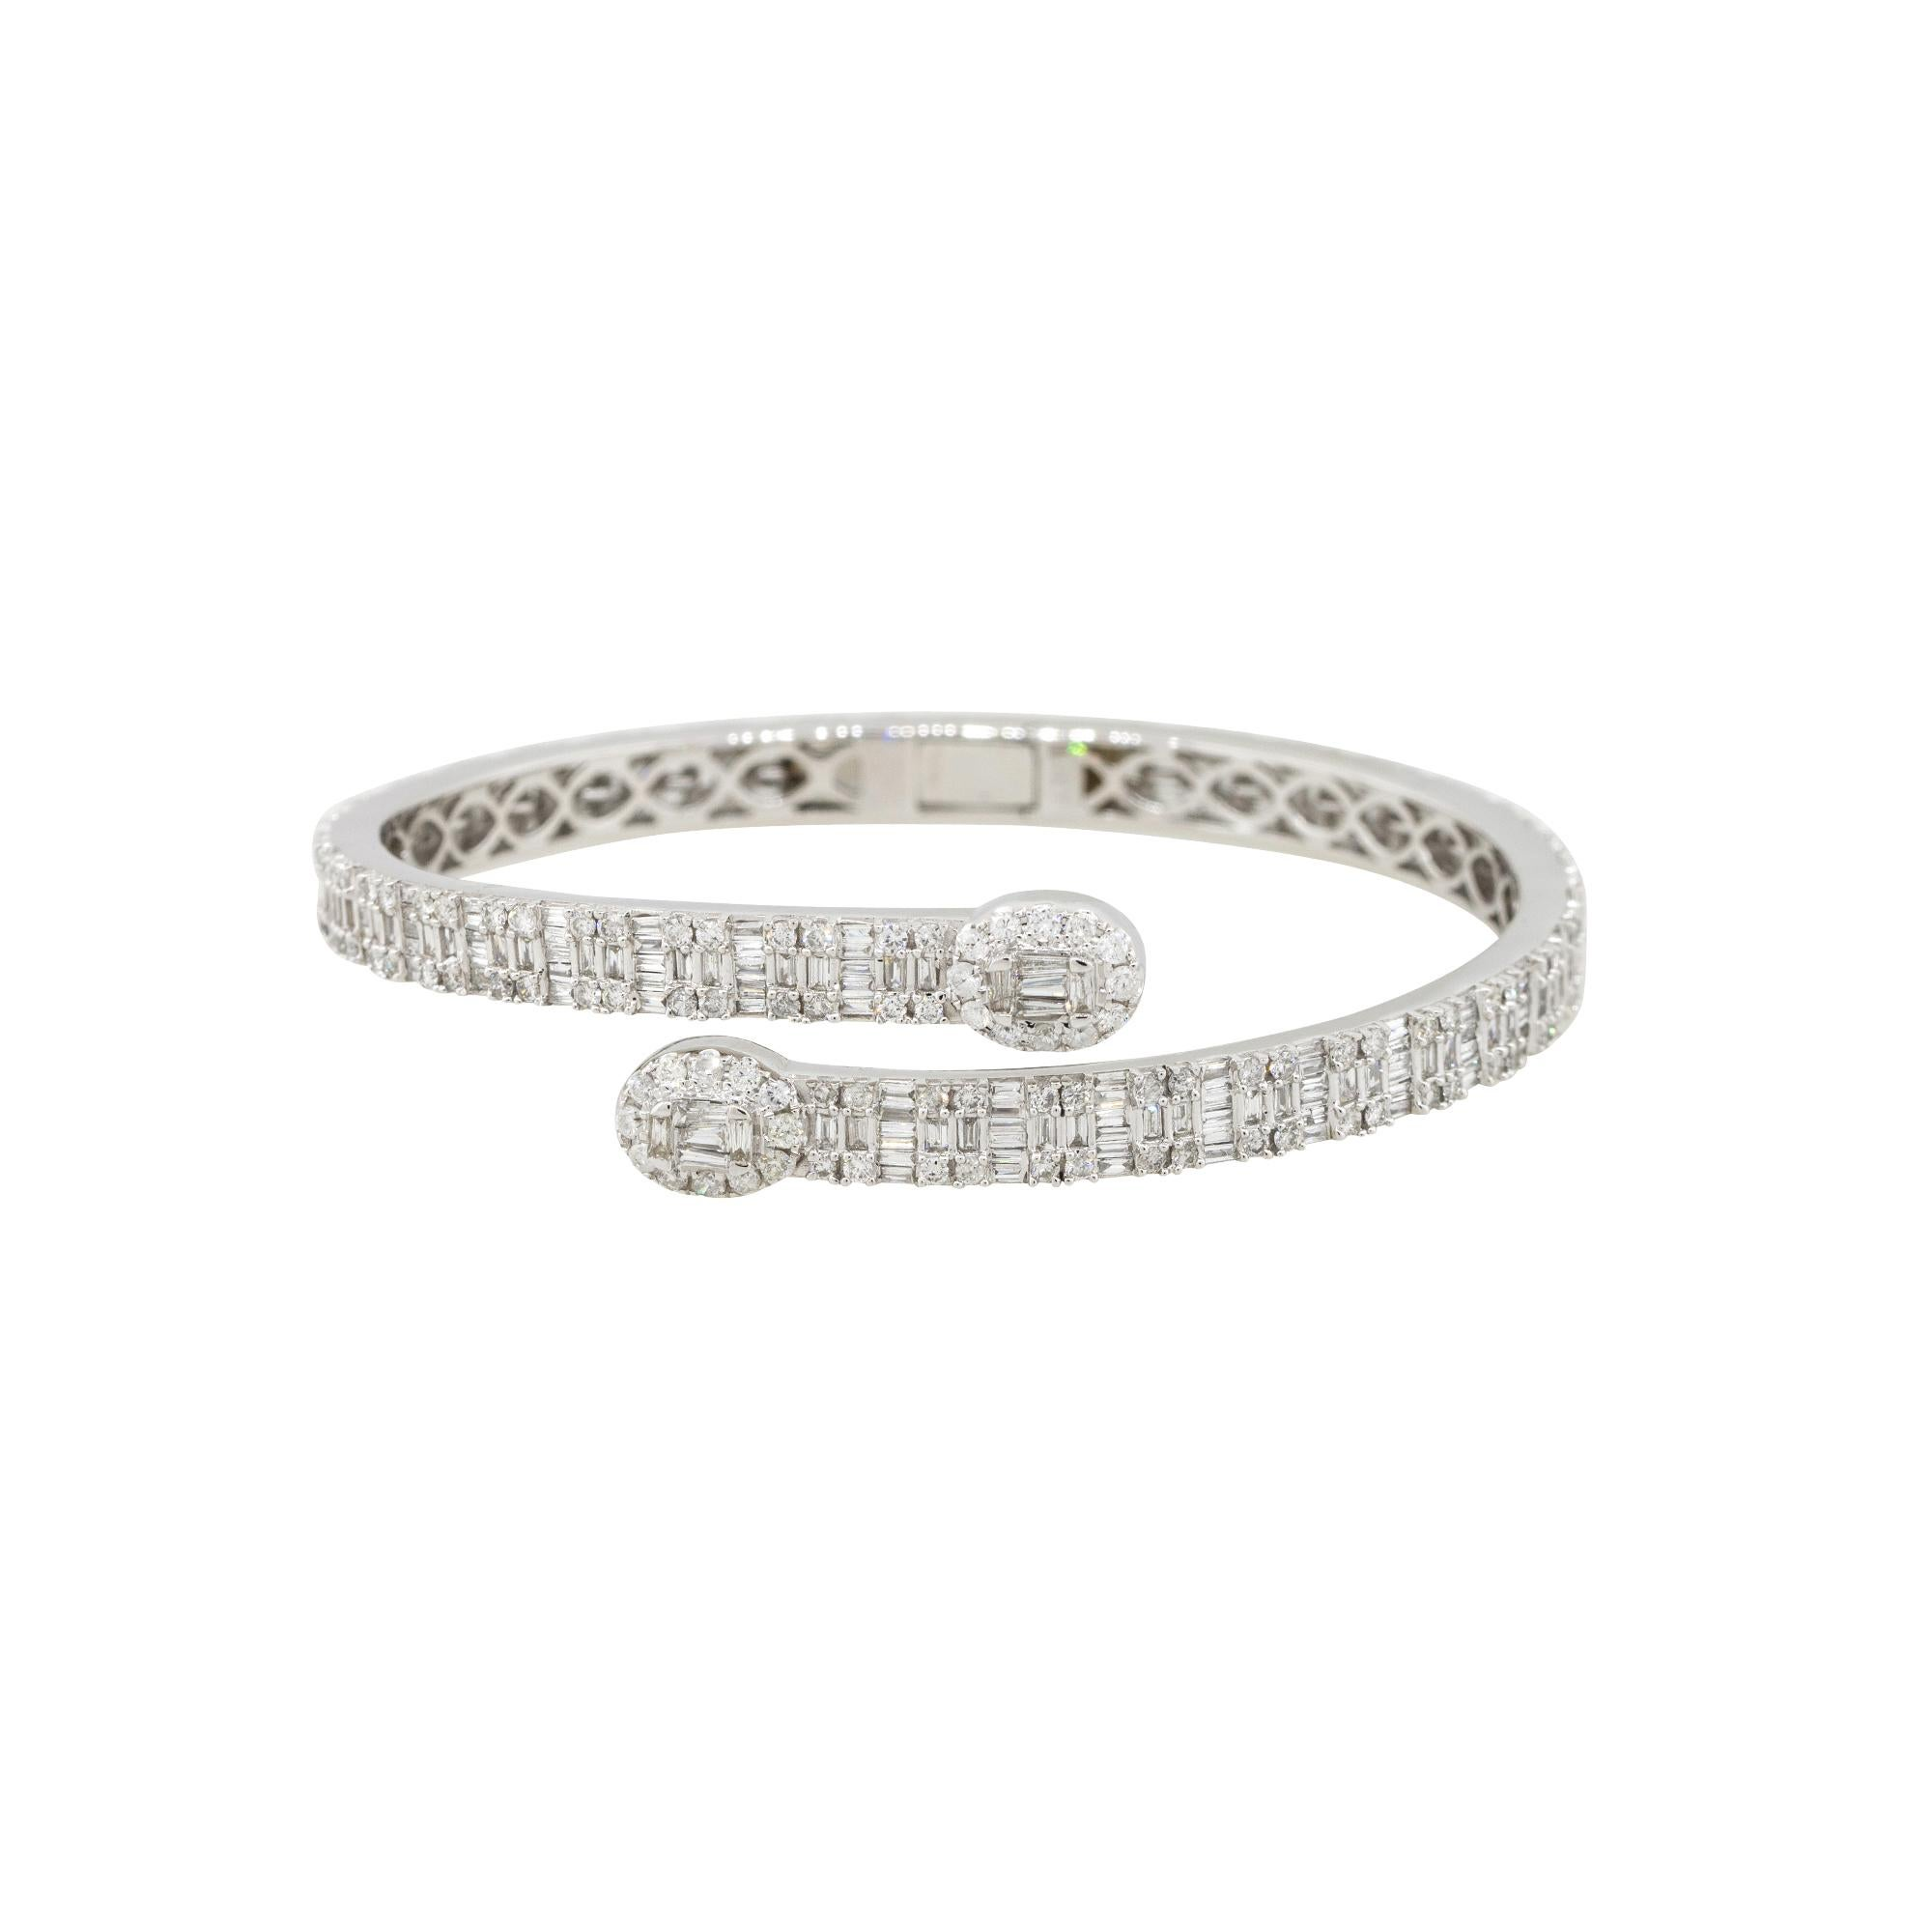 4.6 Carat Diamond Pave Open Cuff Bangle Bracelet 14 Karat in Stock